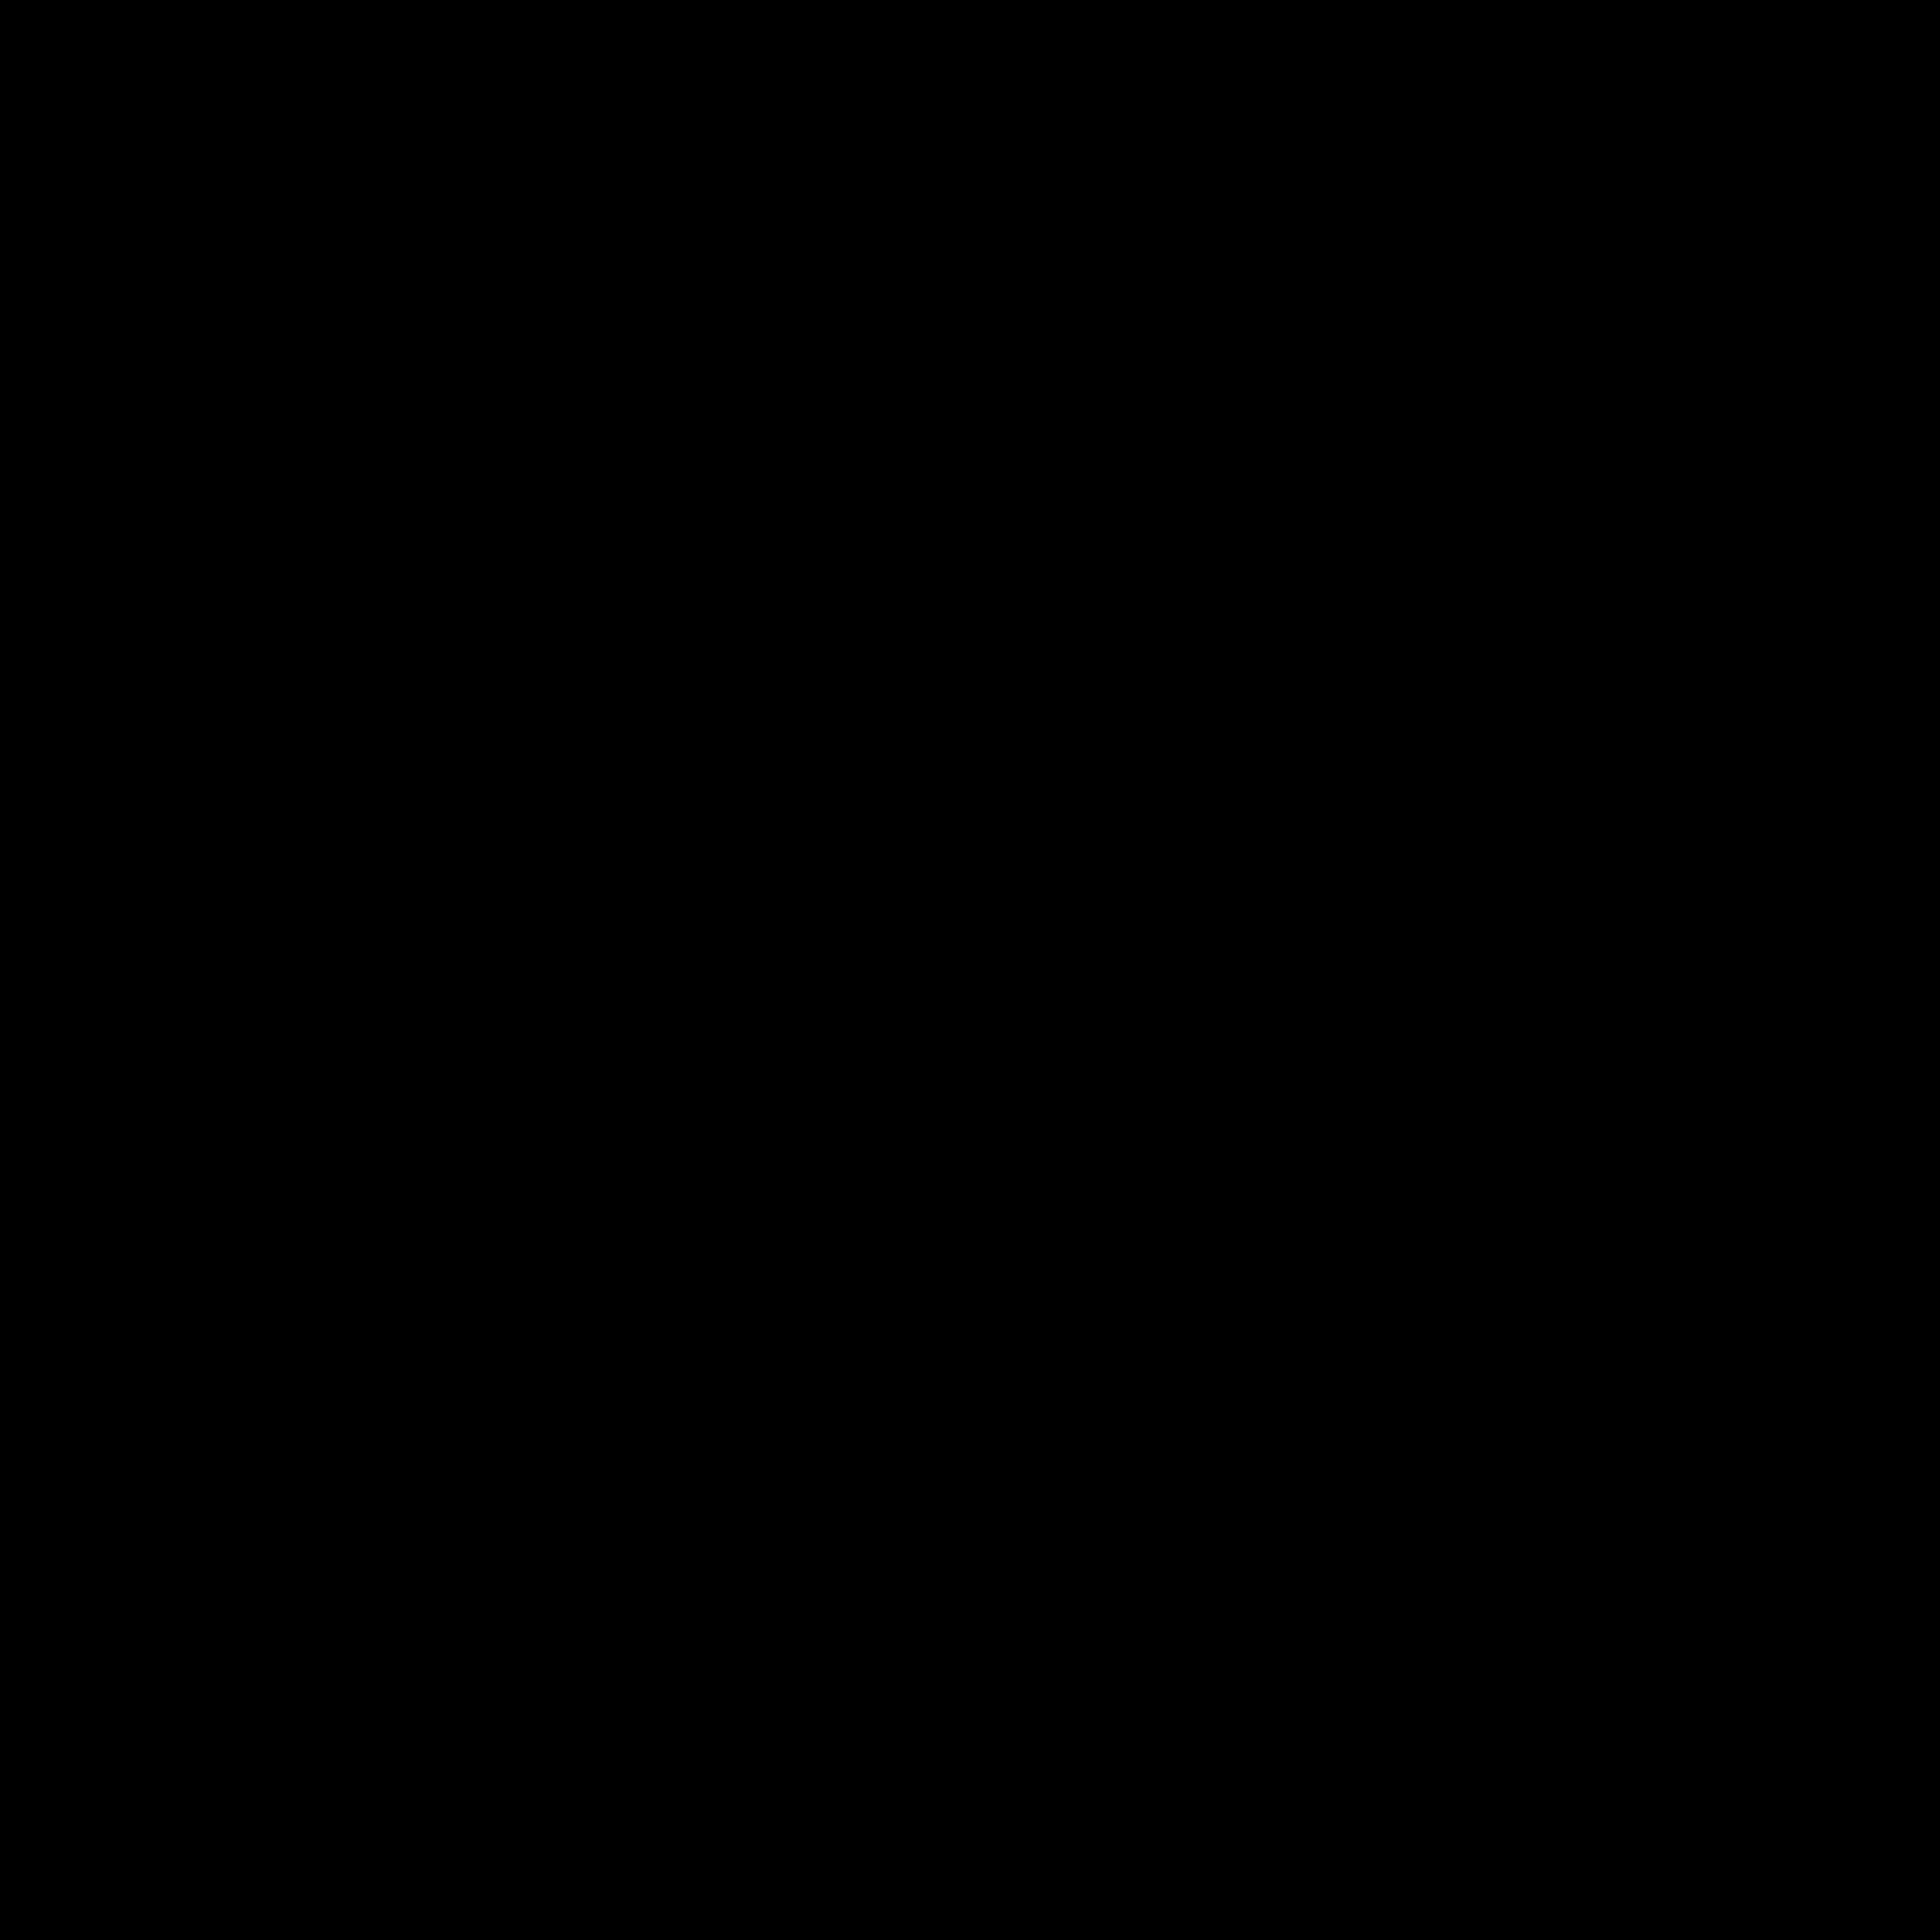 ELO Records Logo PNG Transparent & SVG Vector.